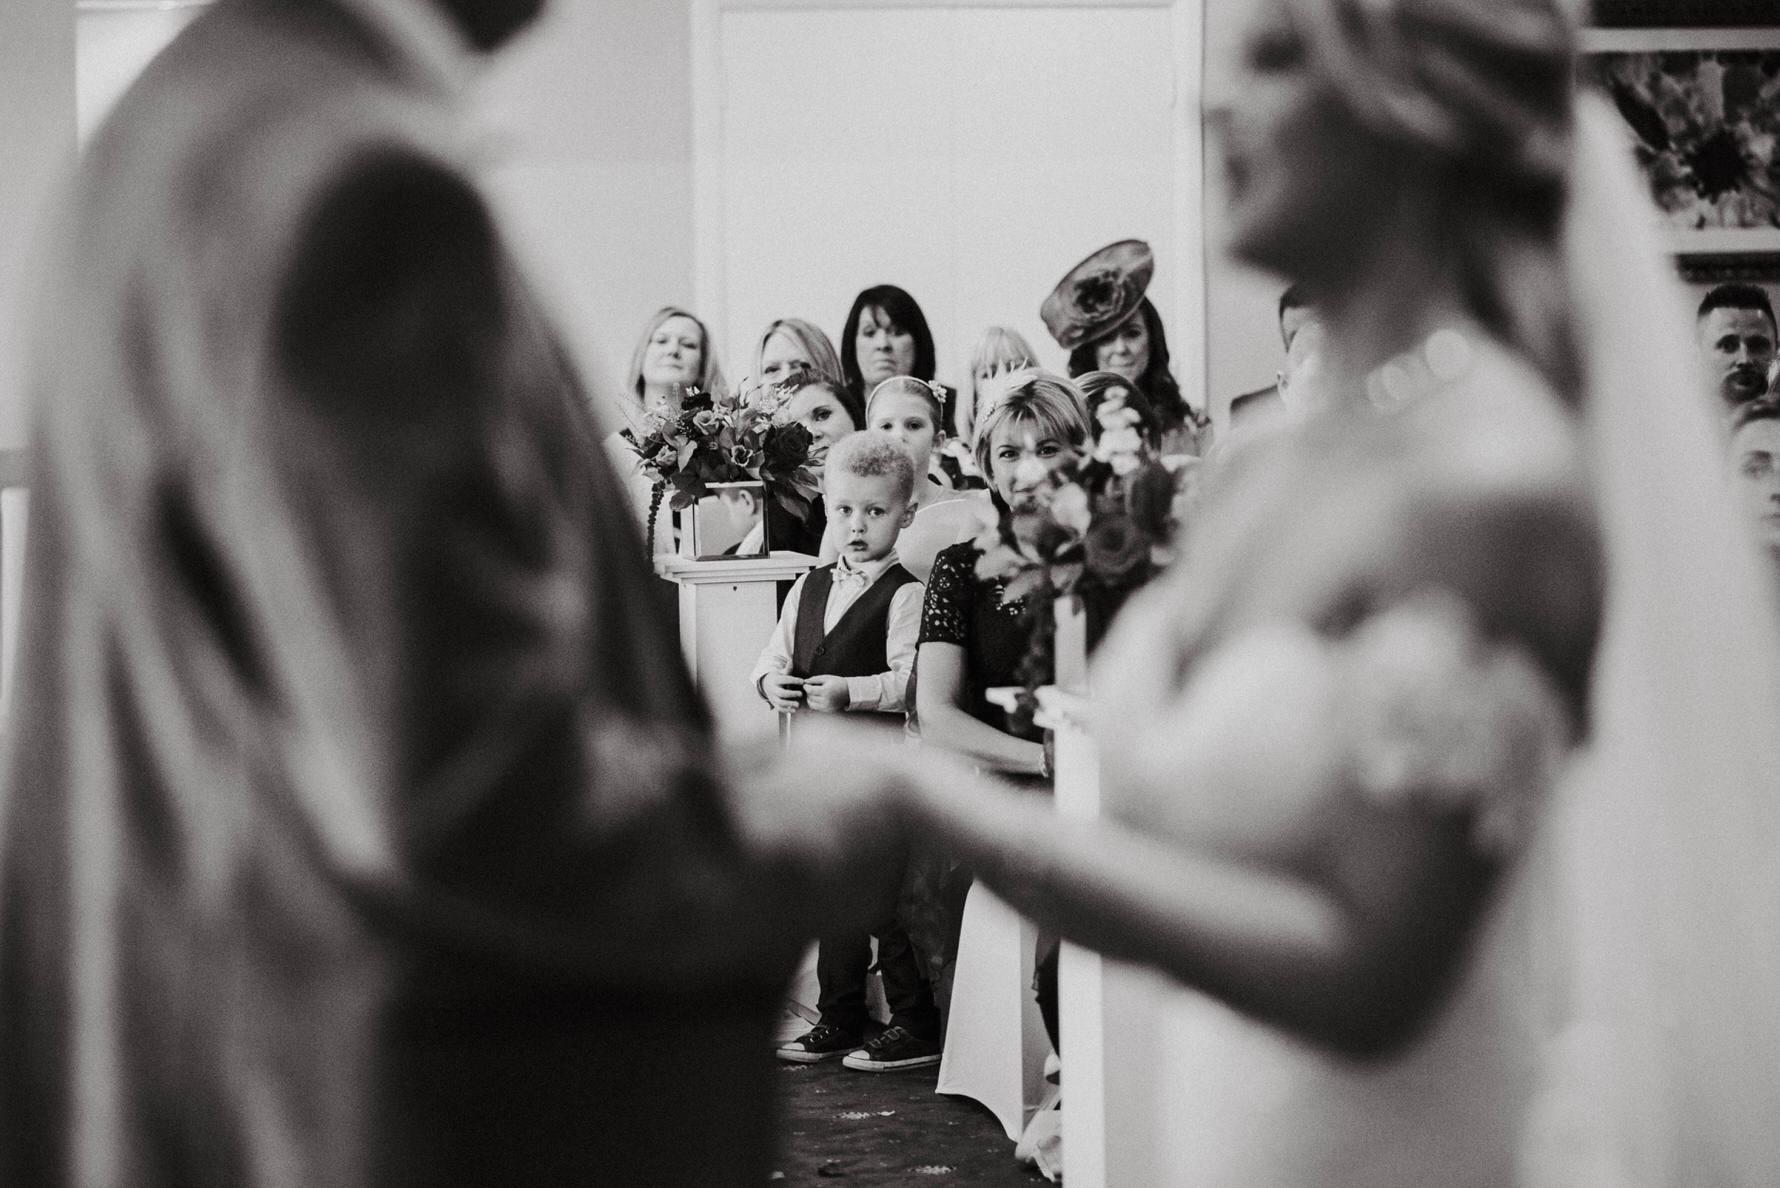 Documentary-wedding-photography-page-boy-watching-wedding-ceremony.jpg